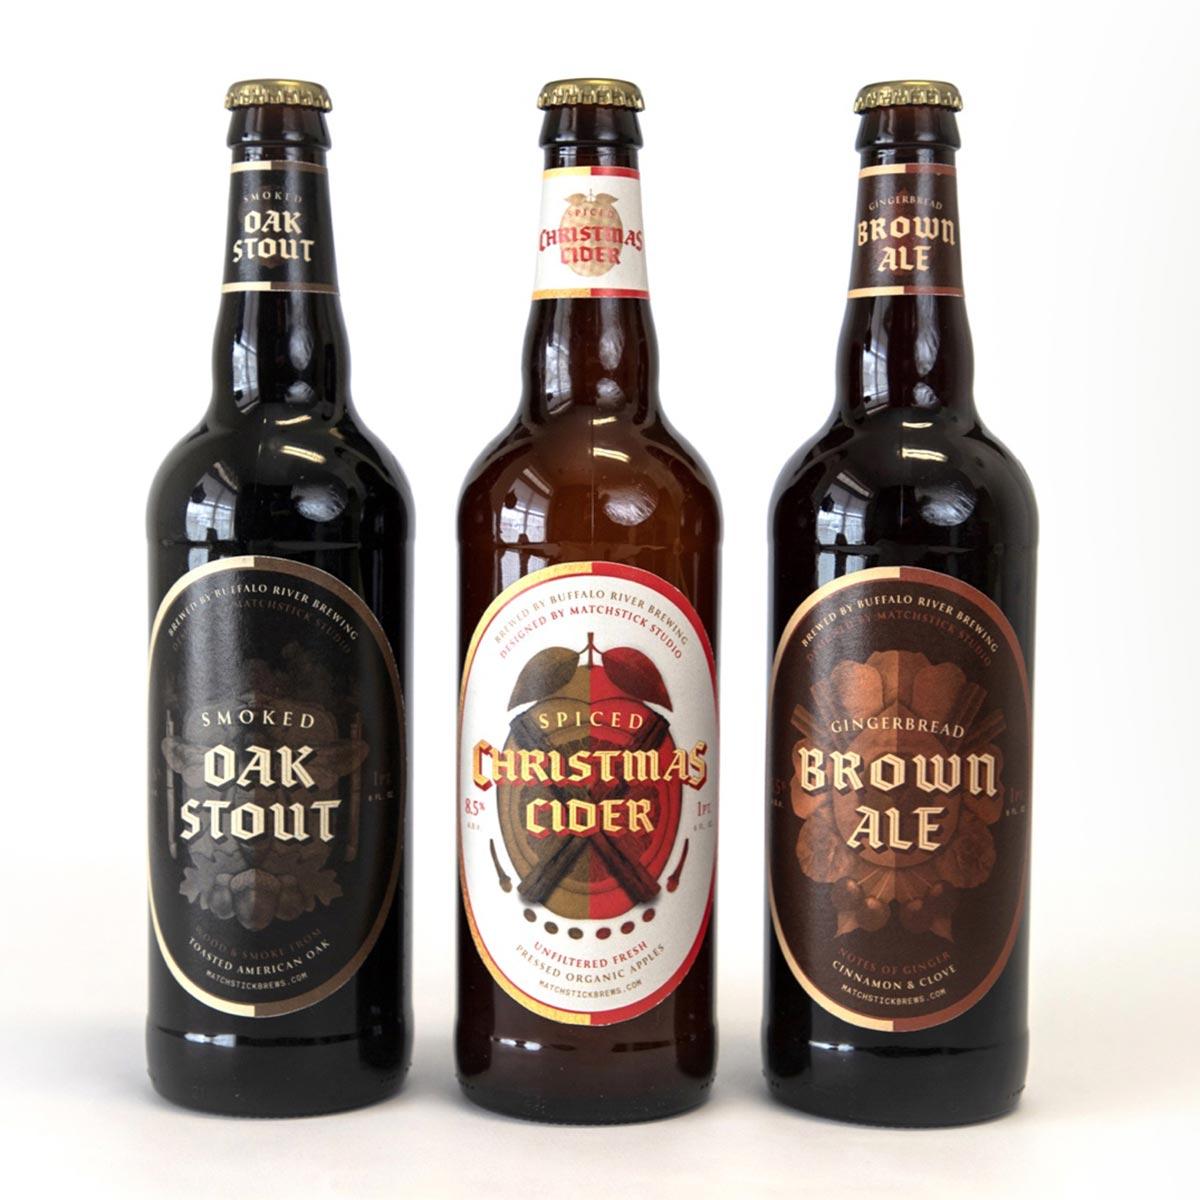 matchstick brews beer bottles